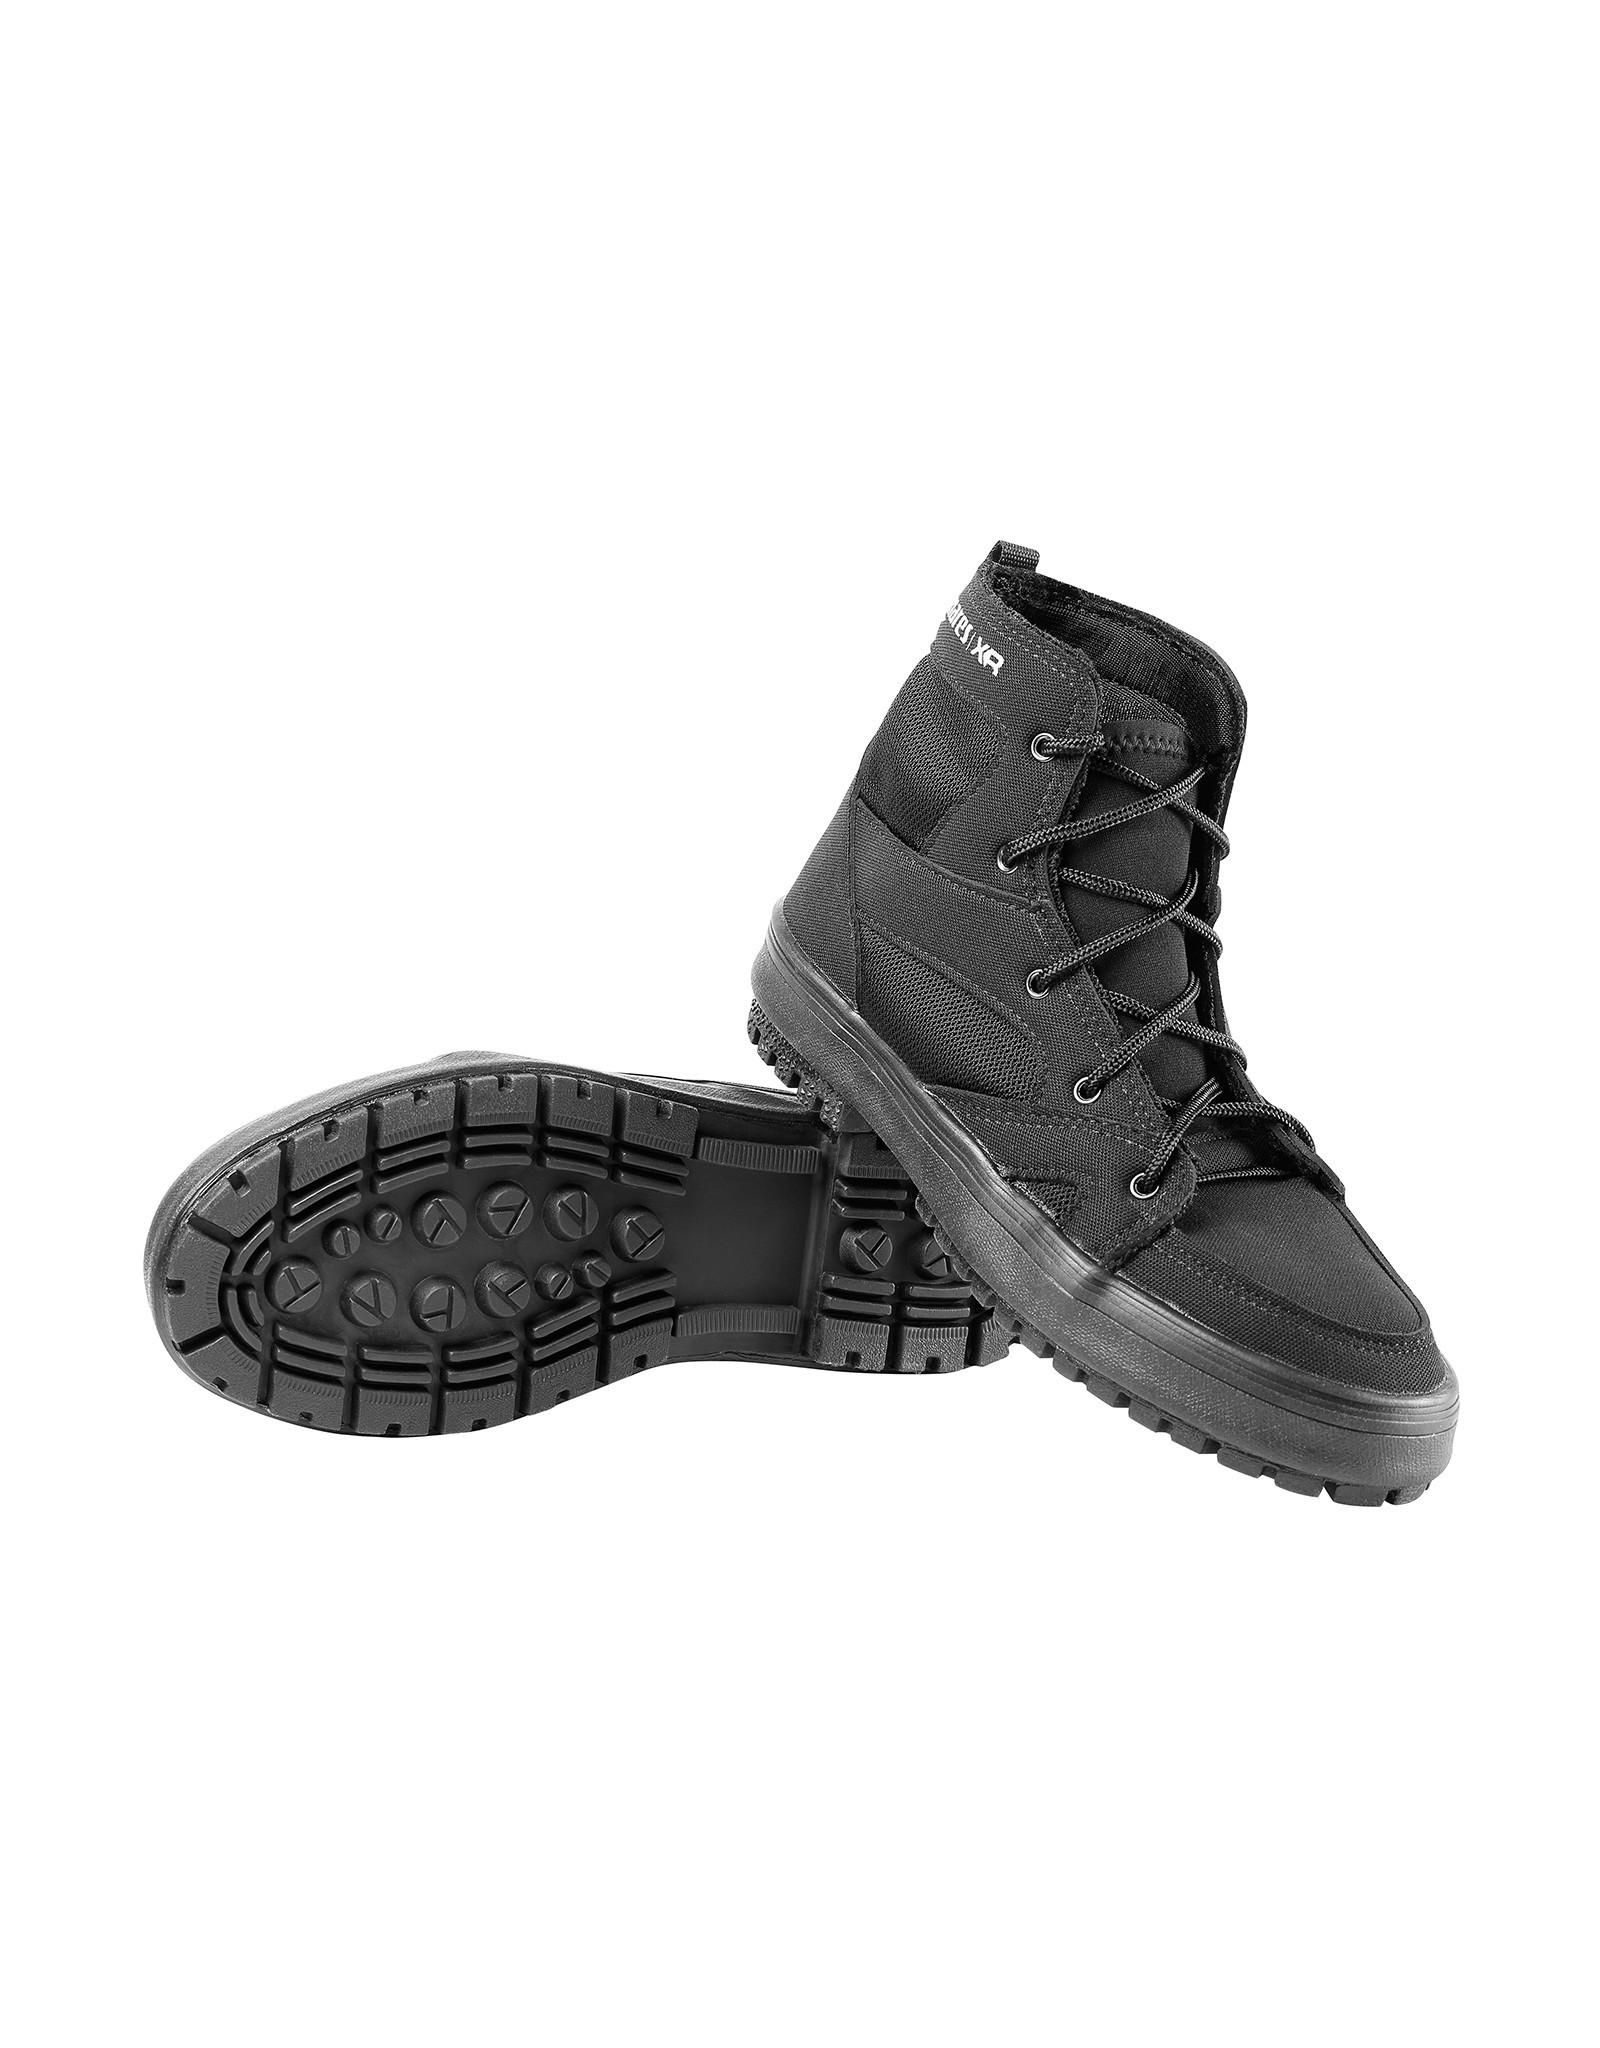 Mares Mares XR Droogpak Rock Boots